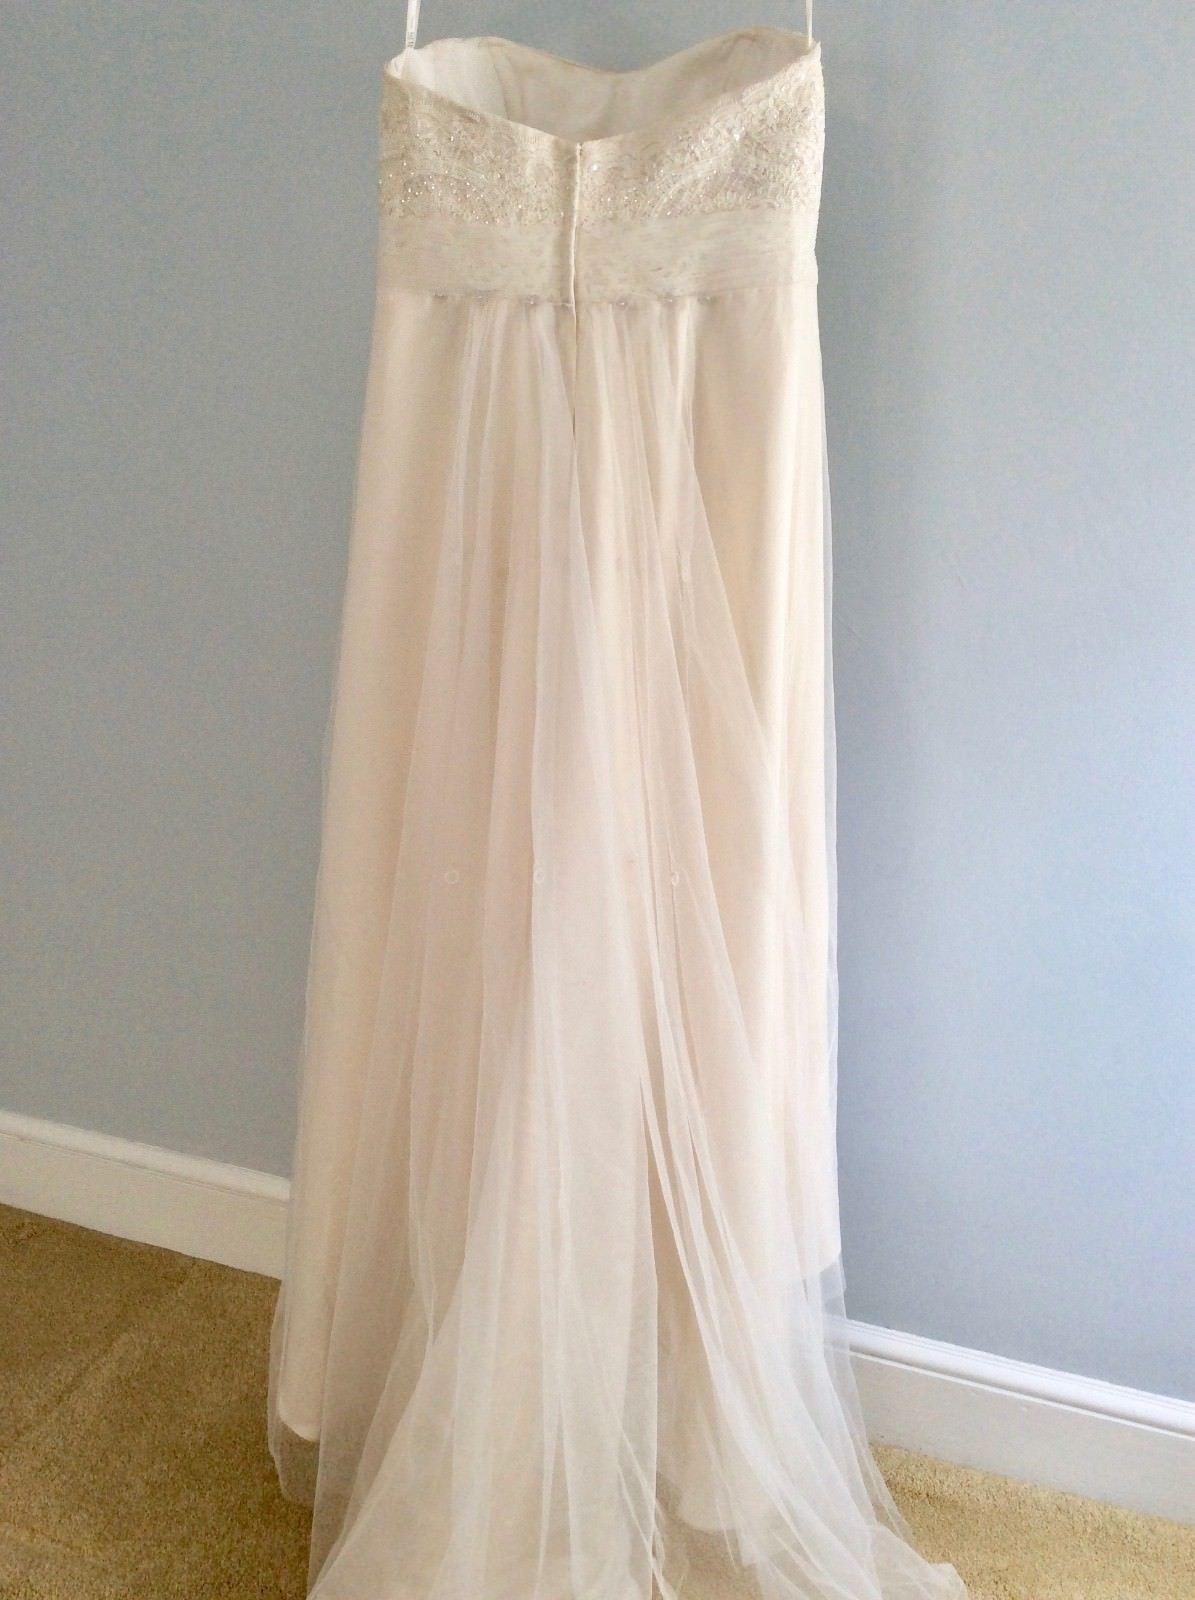 a538ea244e9e1 Wedding Gown, David's Bridal, WG3586, Strapless, Size 14 Altered